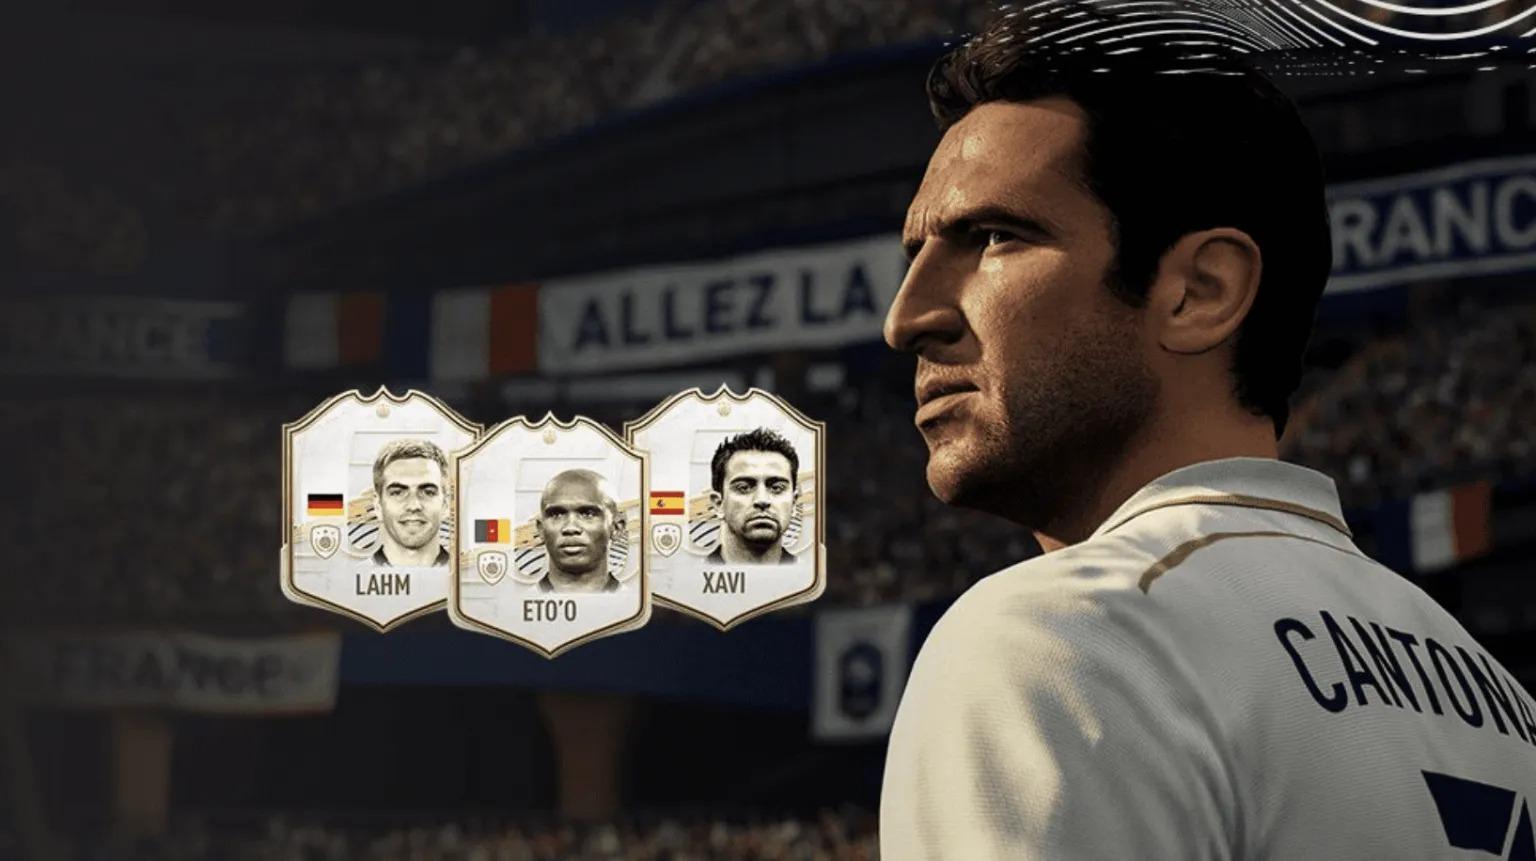 《FIFA 21》超级球星阵型参加阿什利科尔/托雷斯